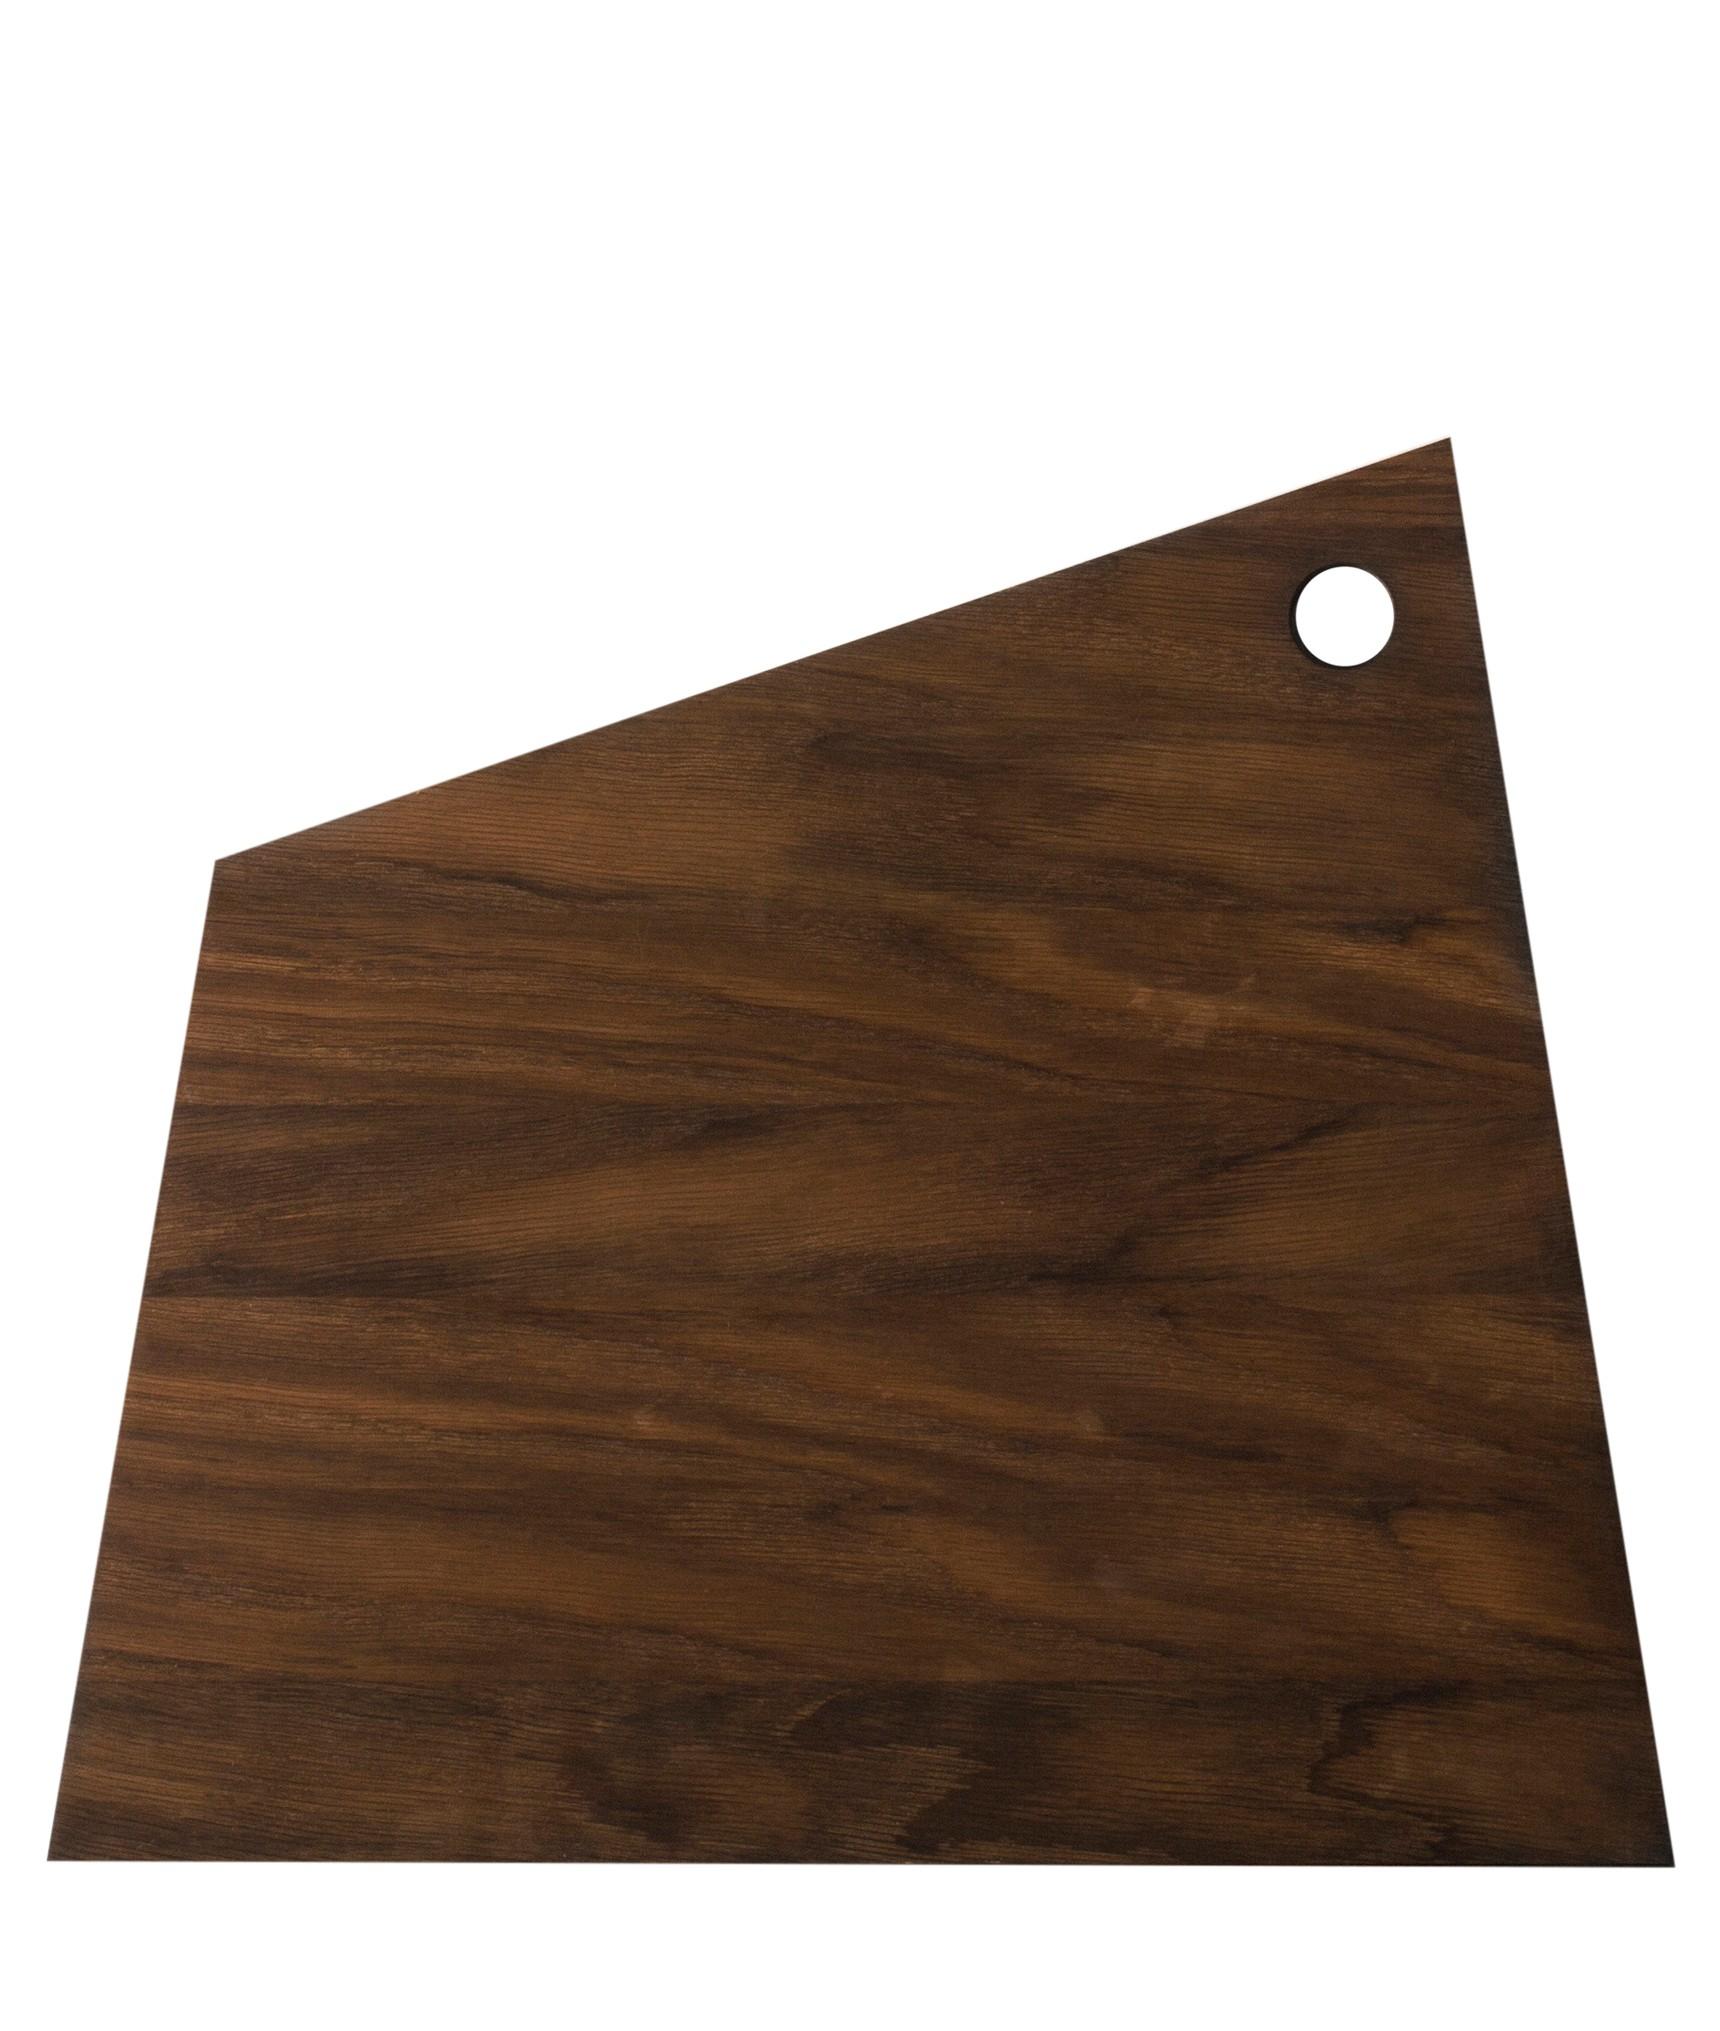 ferm living asymmetric cutting board large k che esszimmer eco lifestyle bei glore kaufen. Black Bedroom Furniture Sets. Home Design Ideas